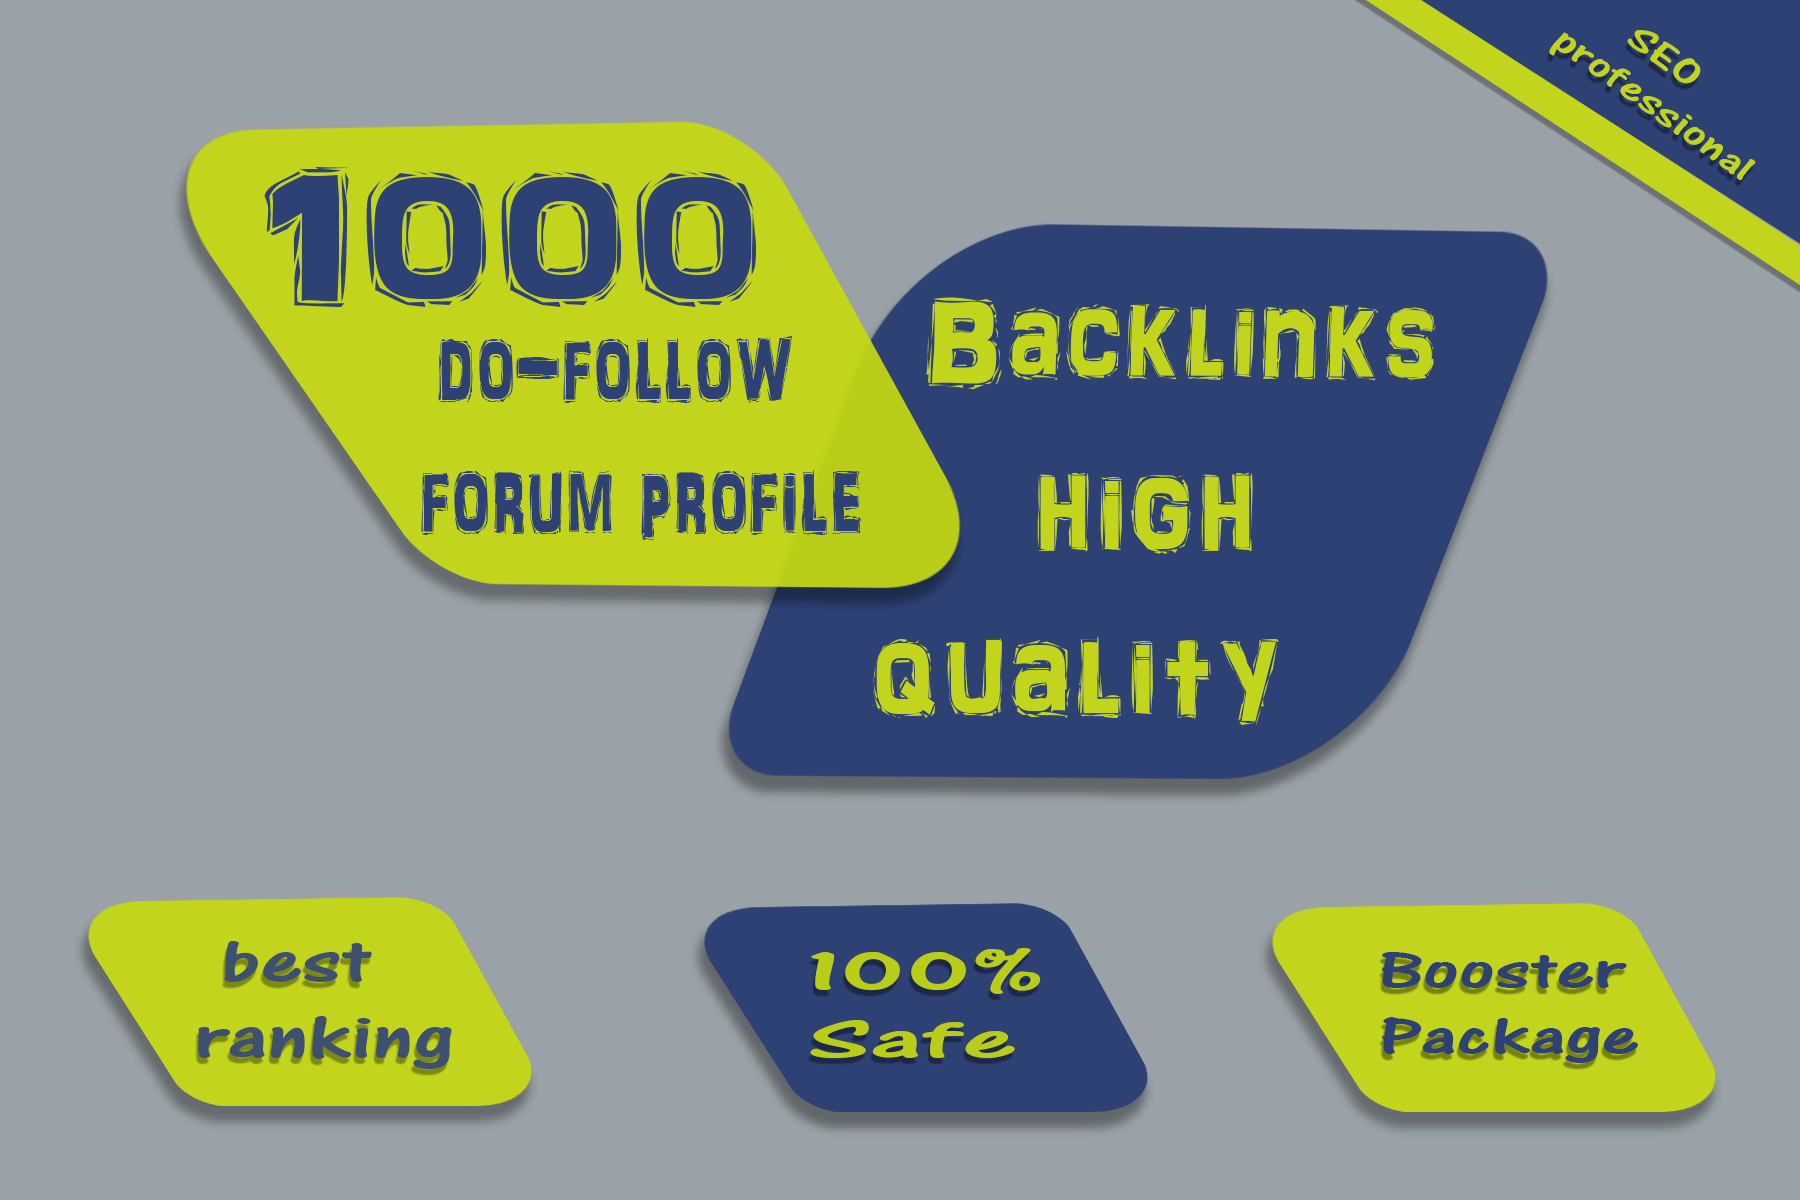 Provide 3000+ Forum Profile Back-links seo Link building servies